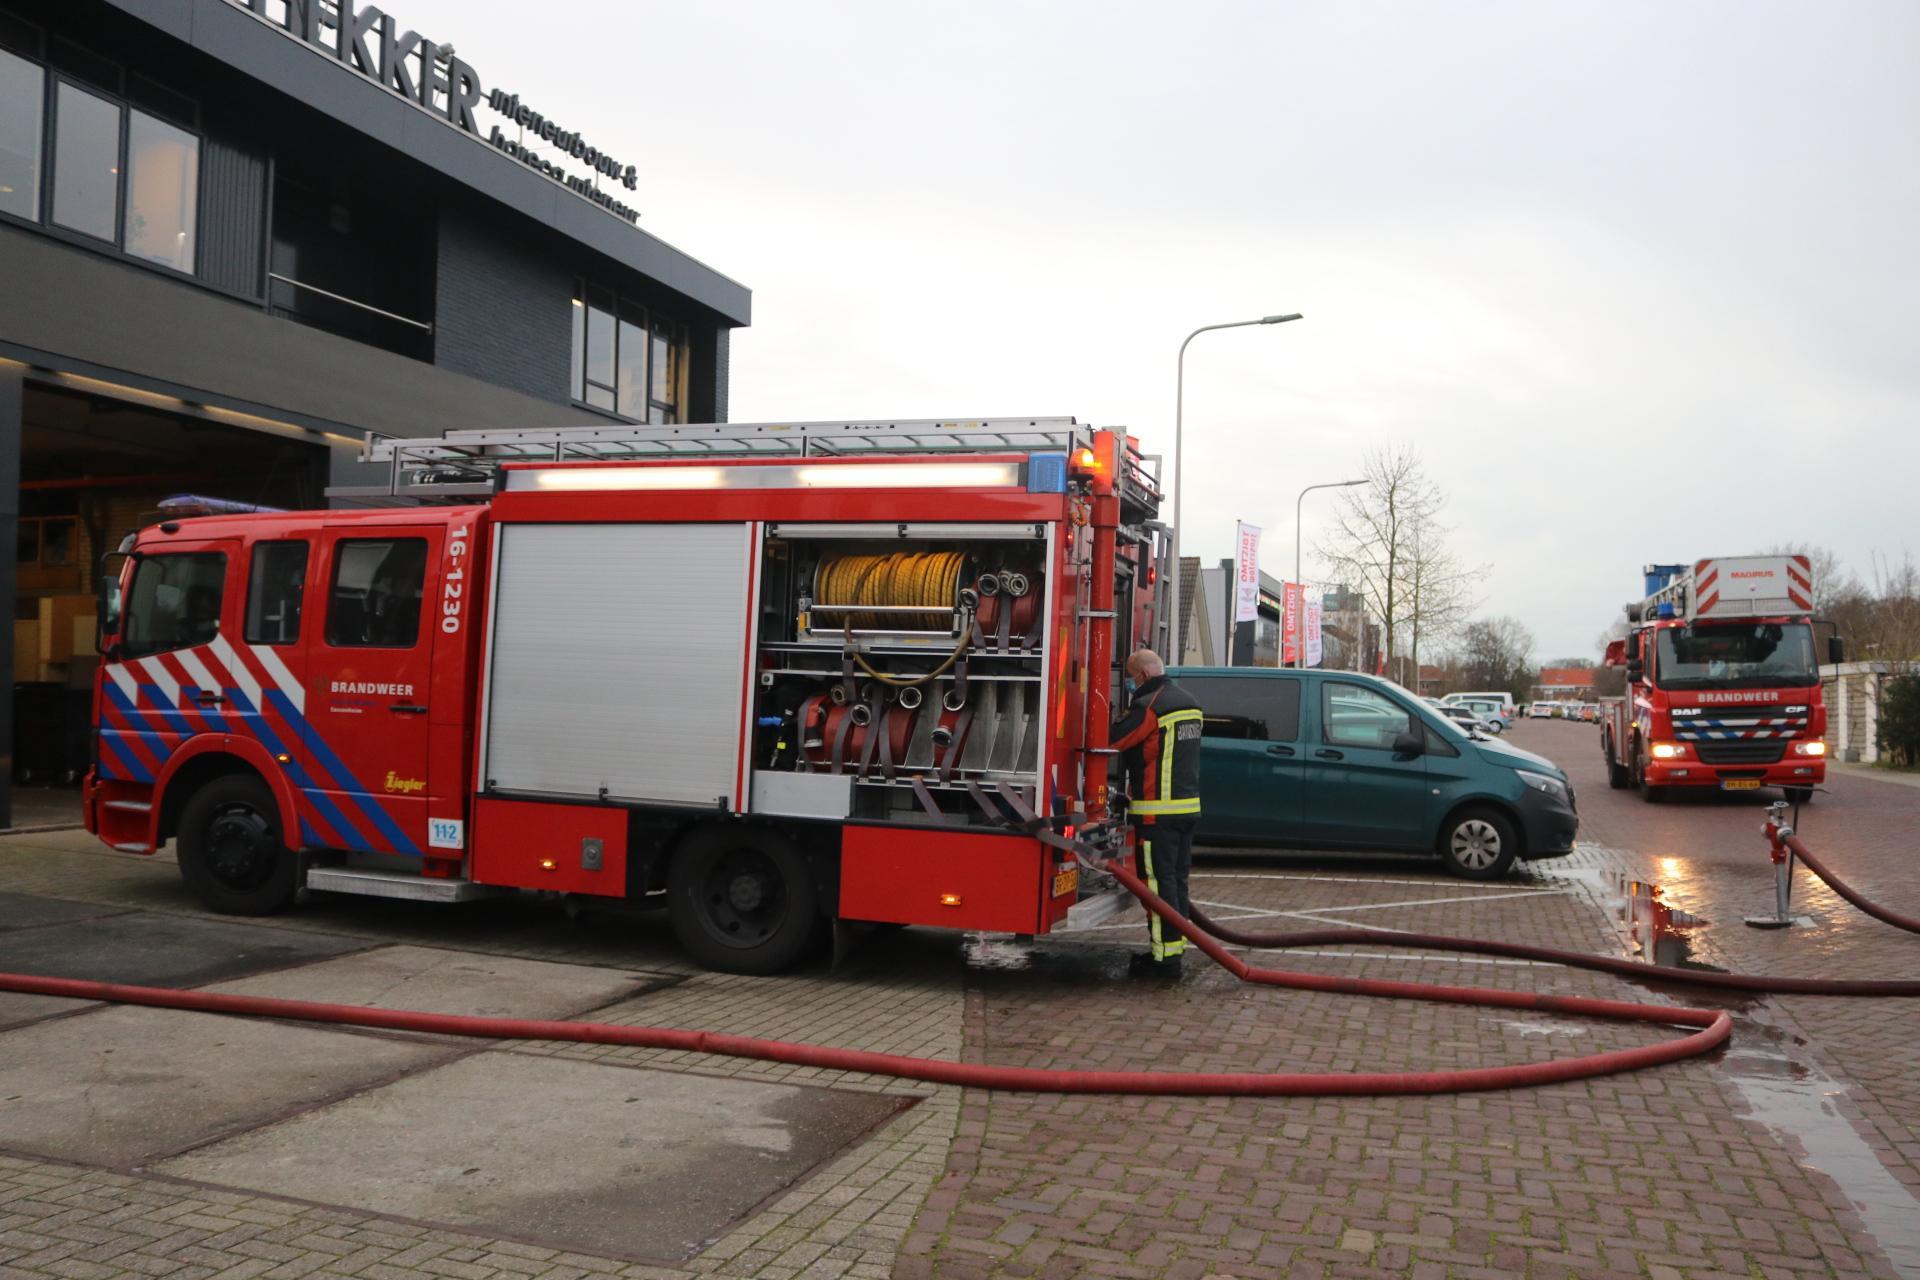 Brand bij houtbewerkingsbedrijf in Sassenheim; industrieterrein afgezet